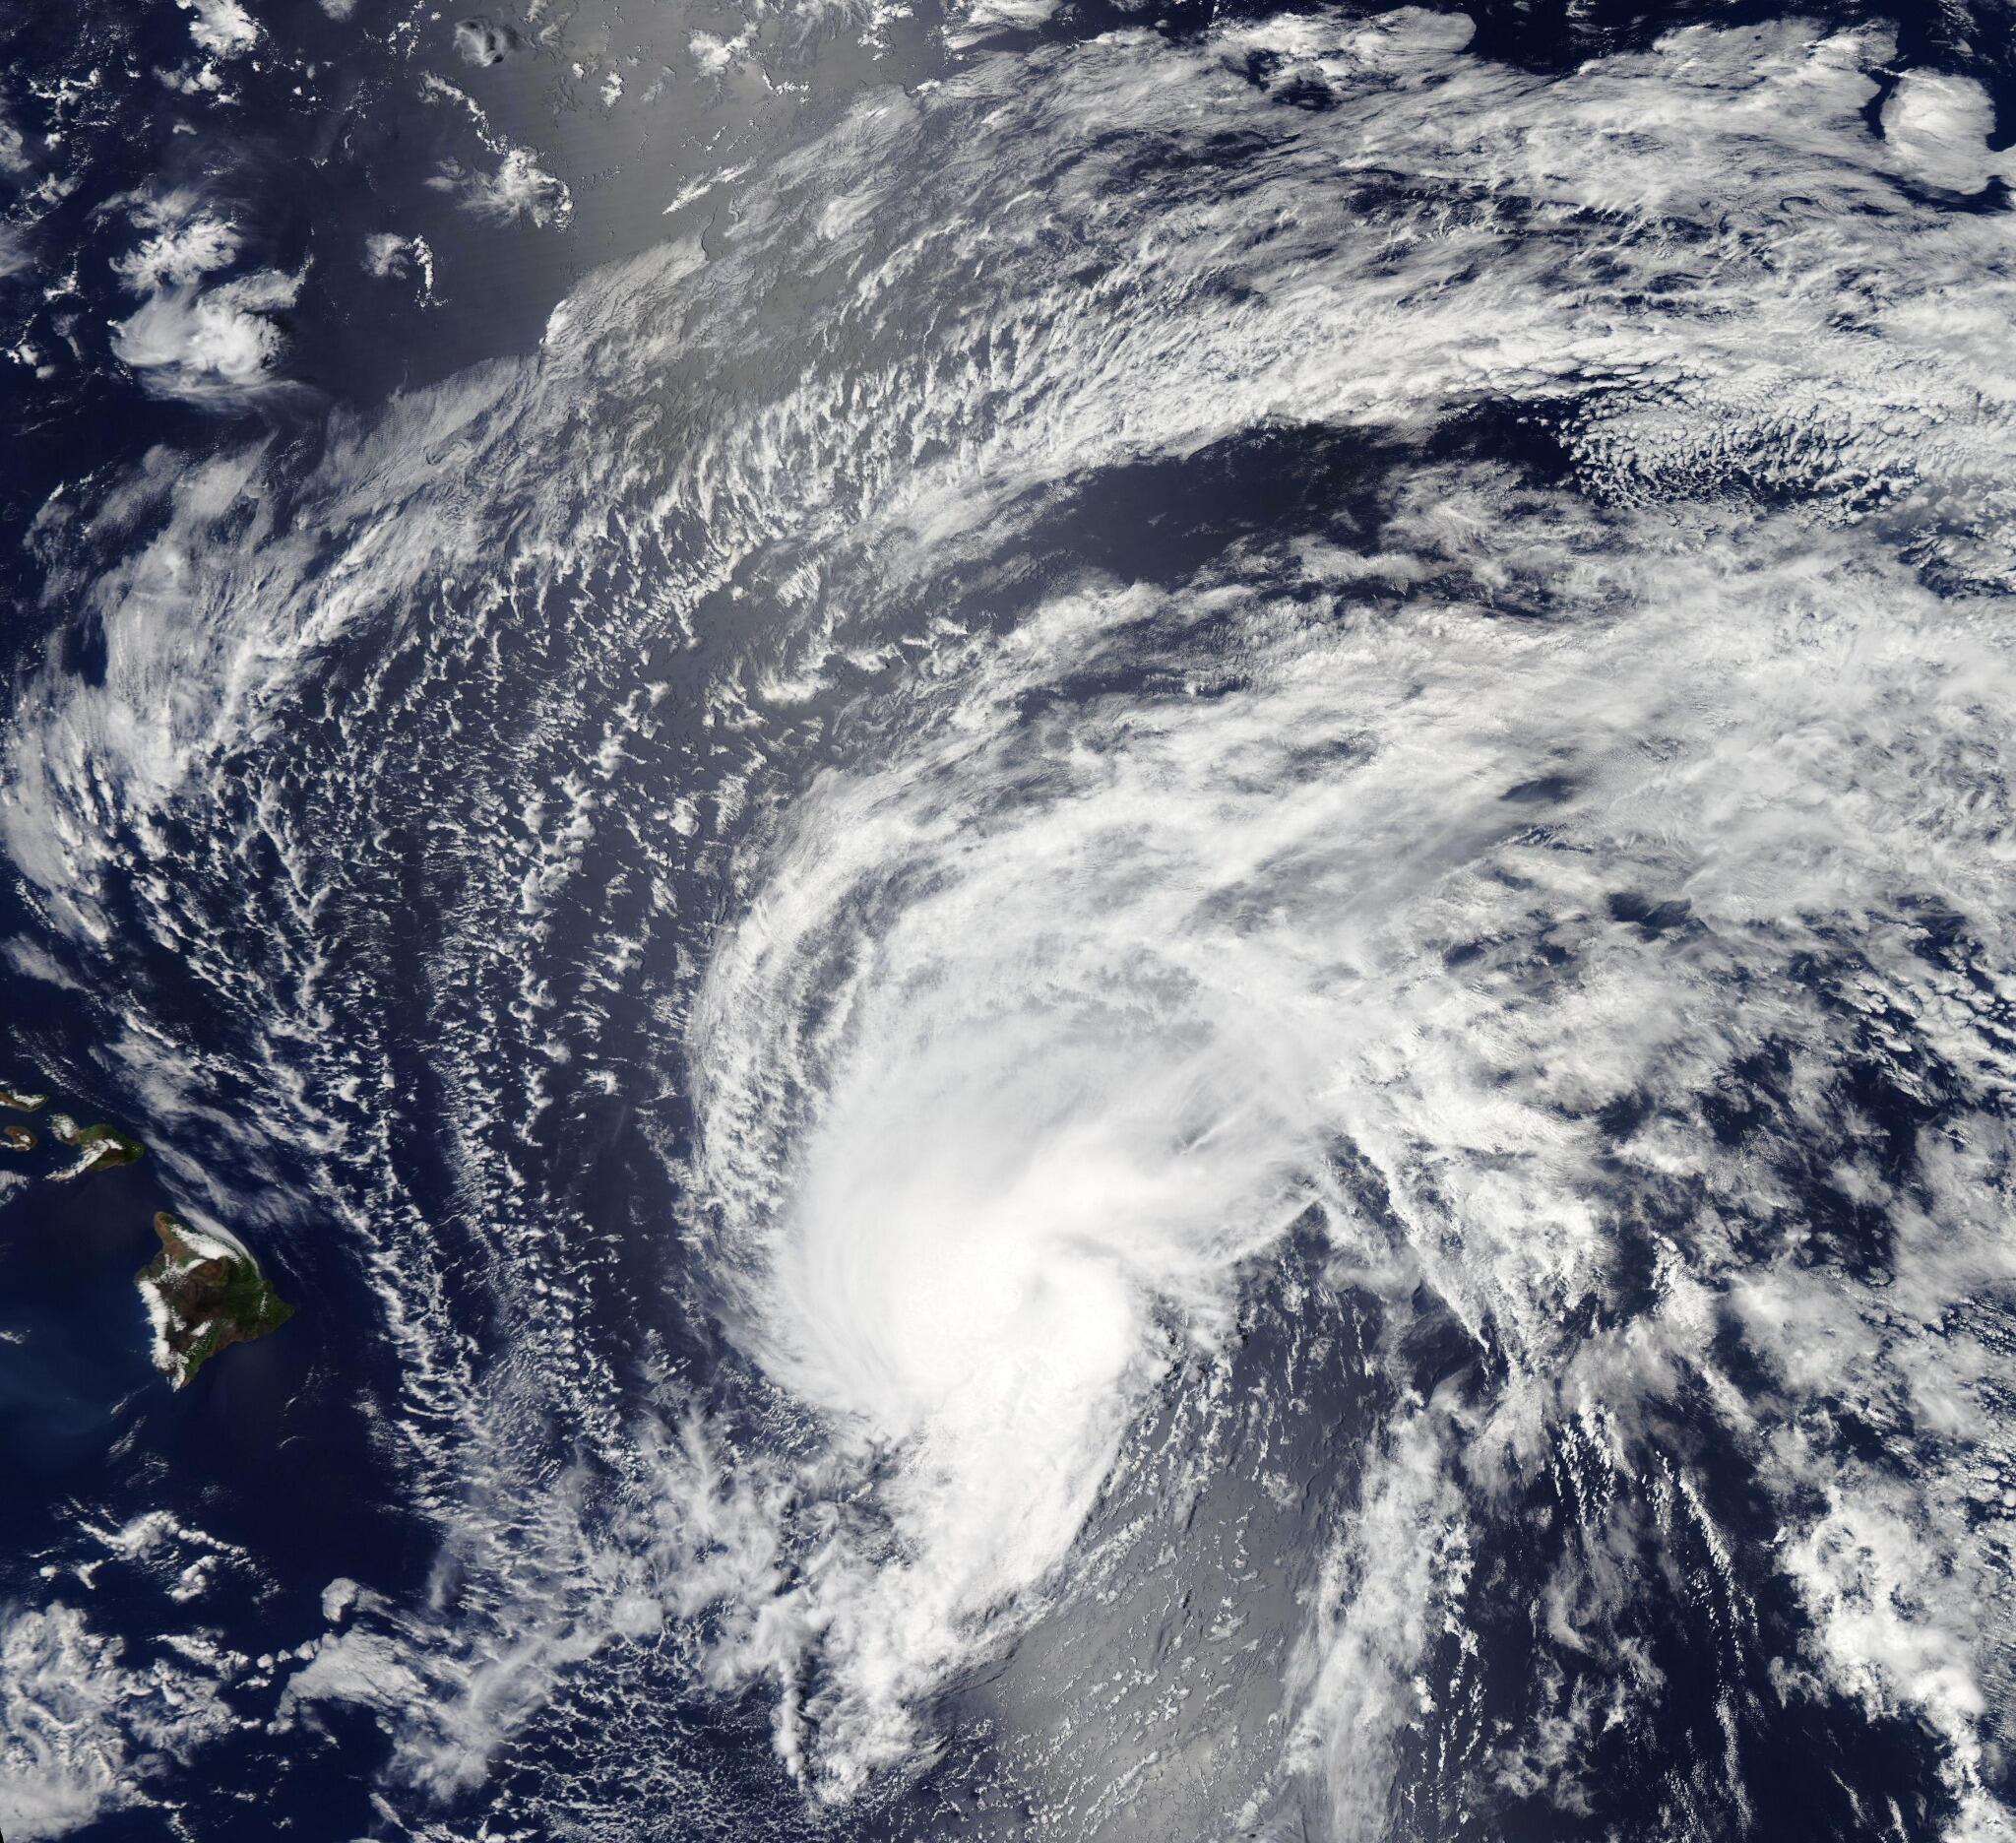 Foto de la tormenta tropical Flossie acercándose a Hawái http://t.co/OywlHqLWSi